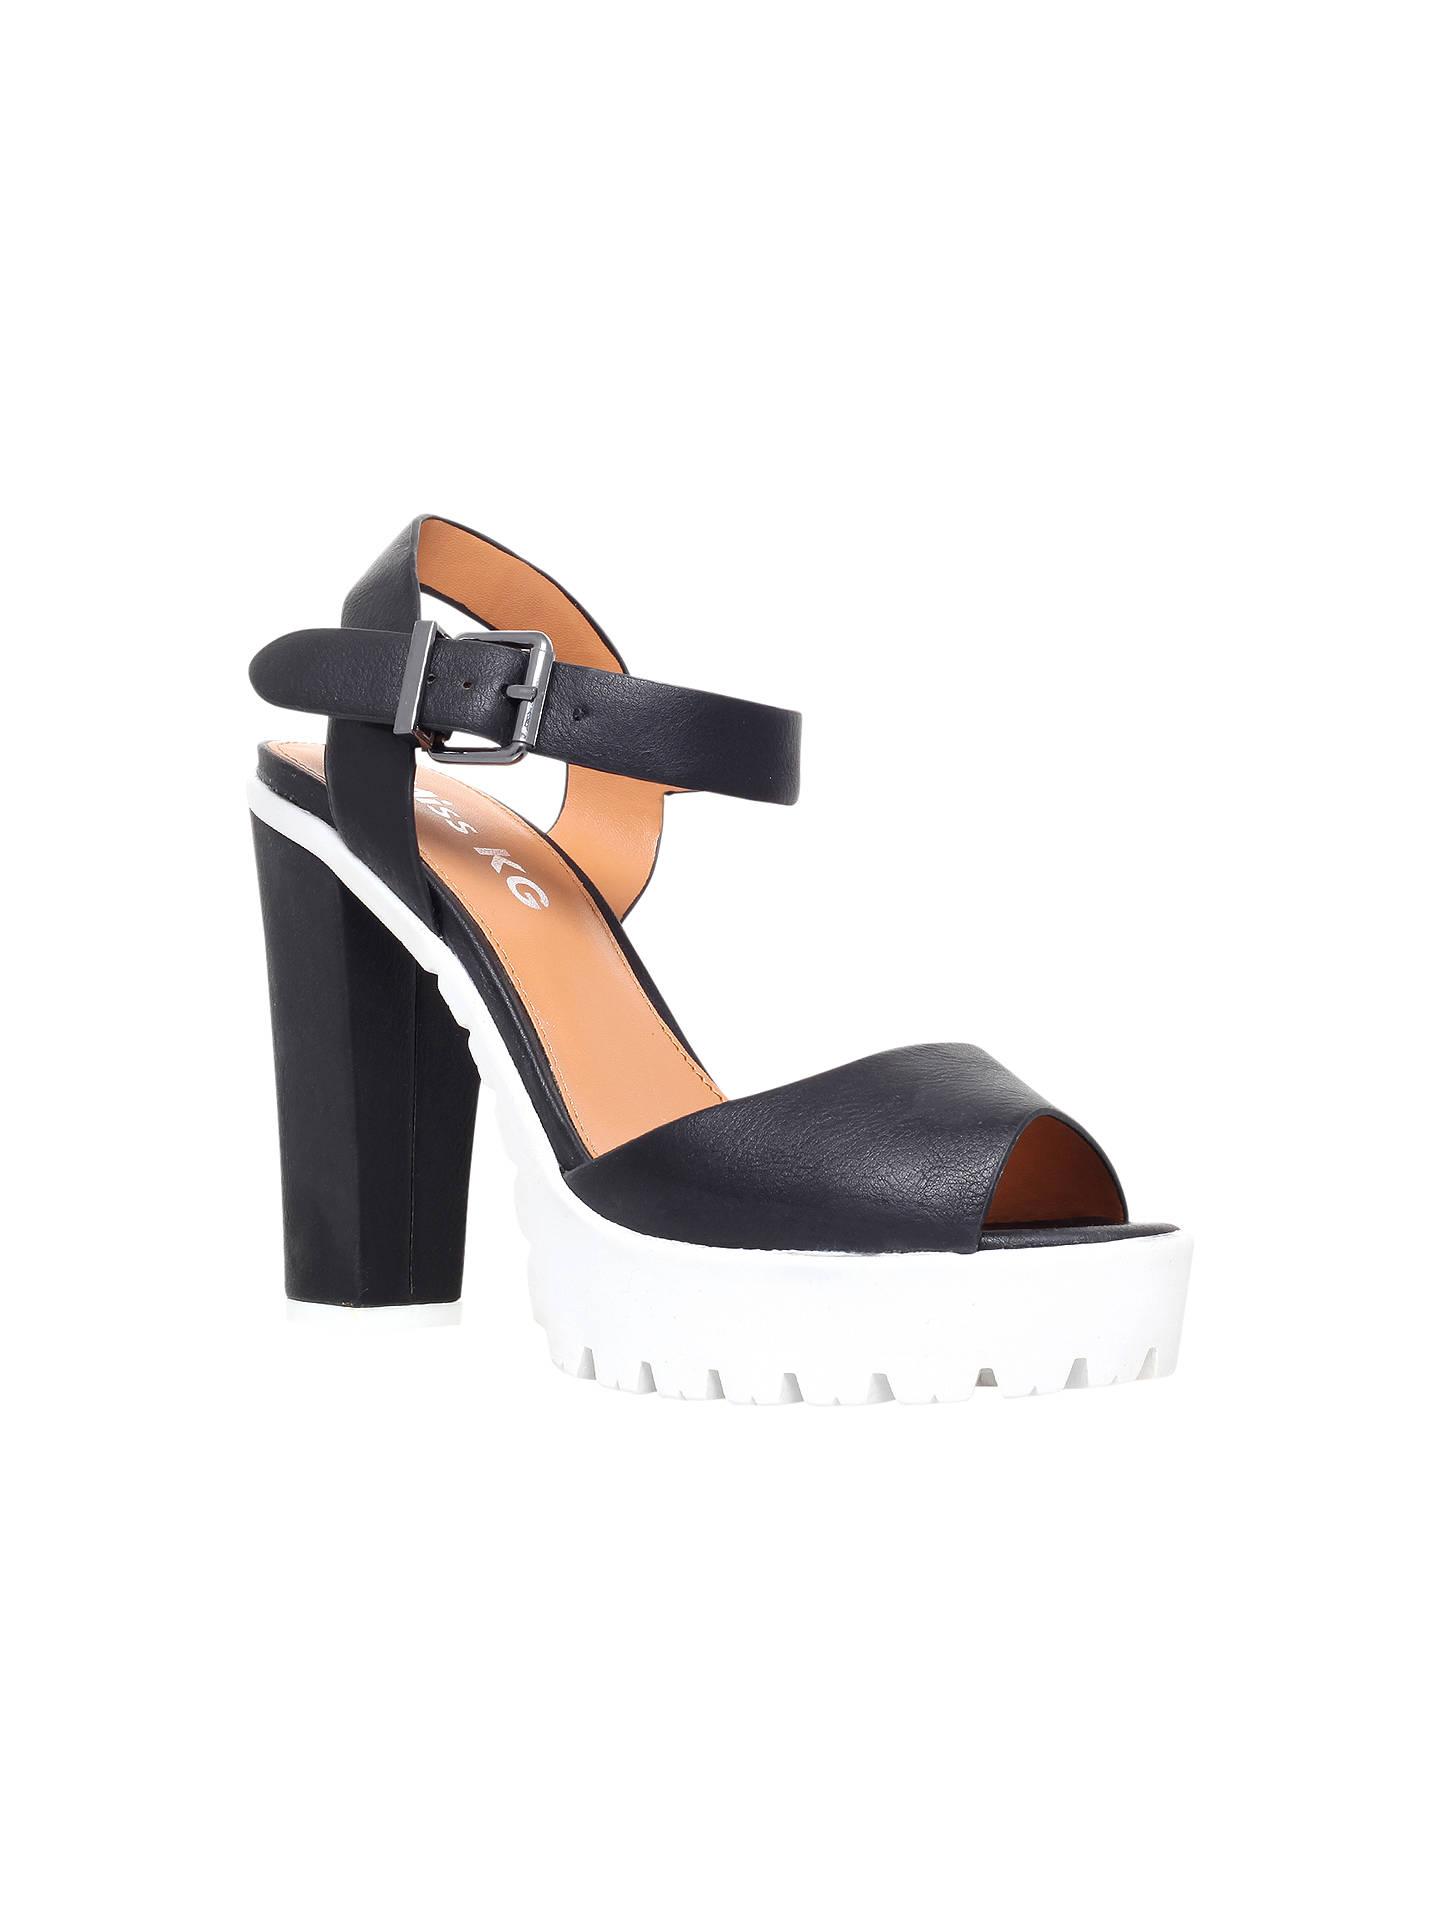 Miss KG Rea Block Heel Sandals at John Lewis & Partners